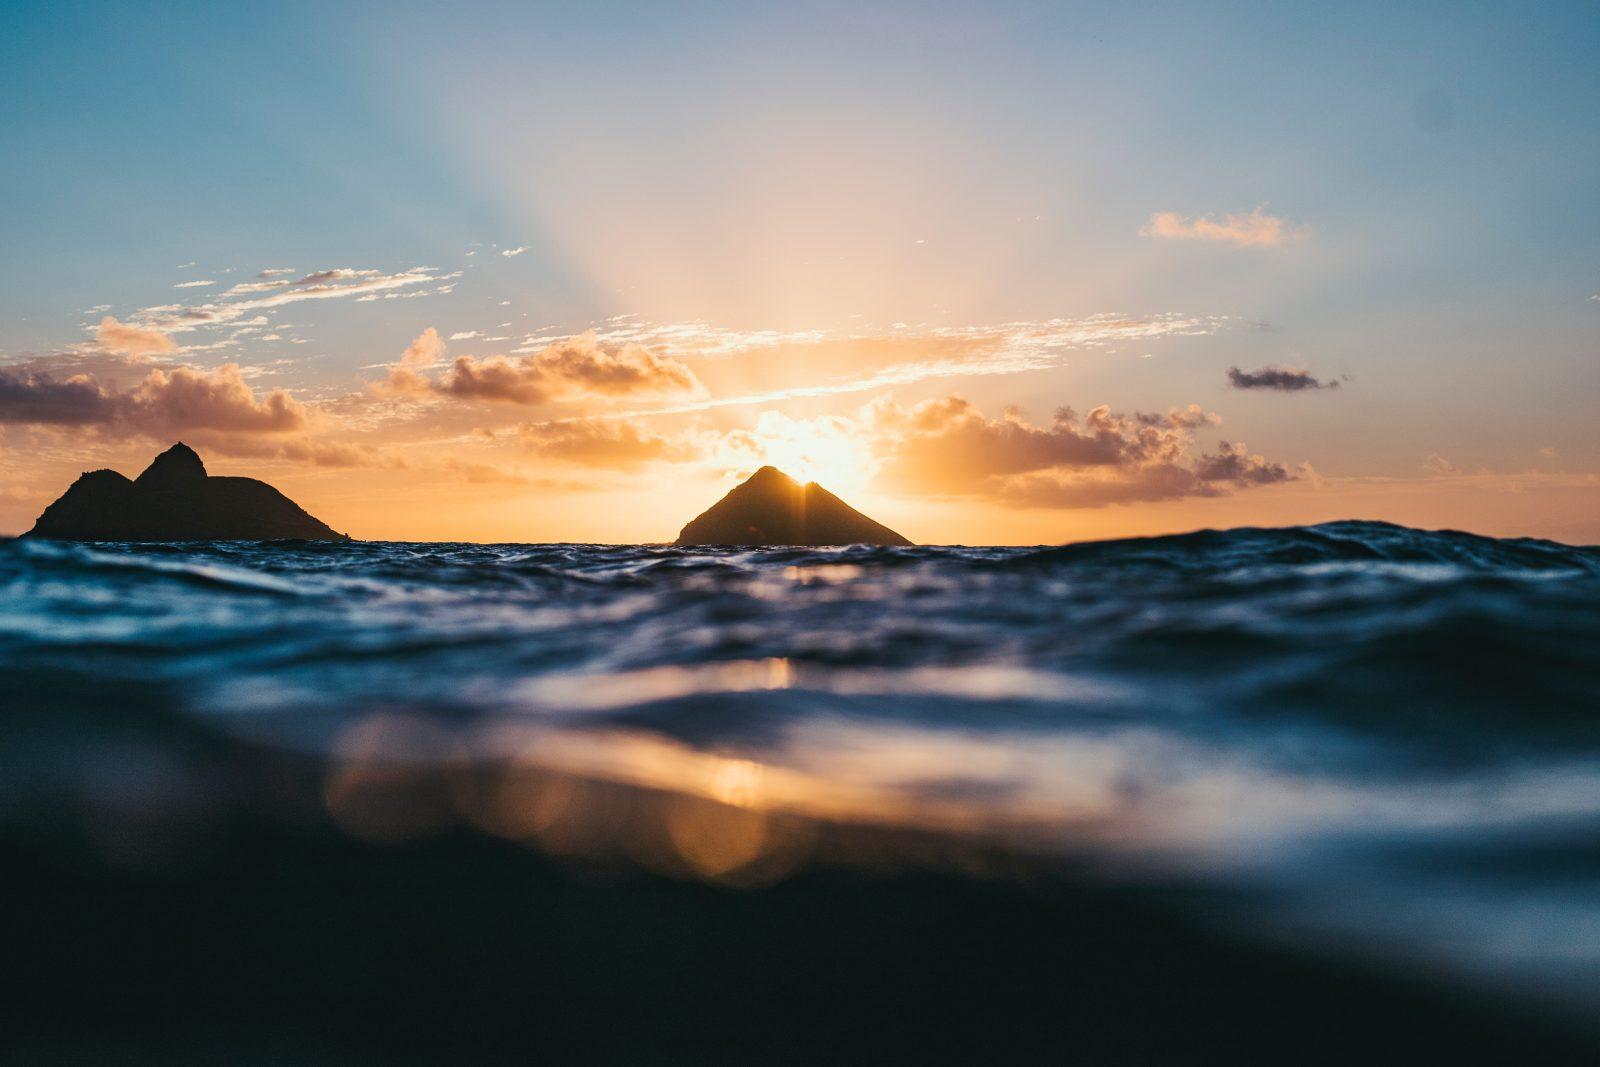 sun setting over the ocean at lanikai beach oahu